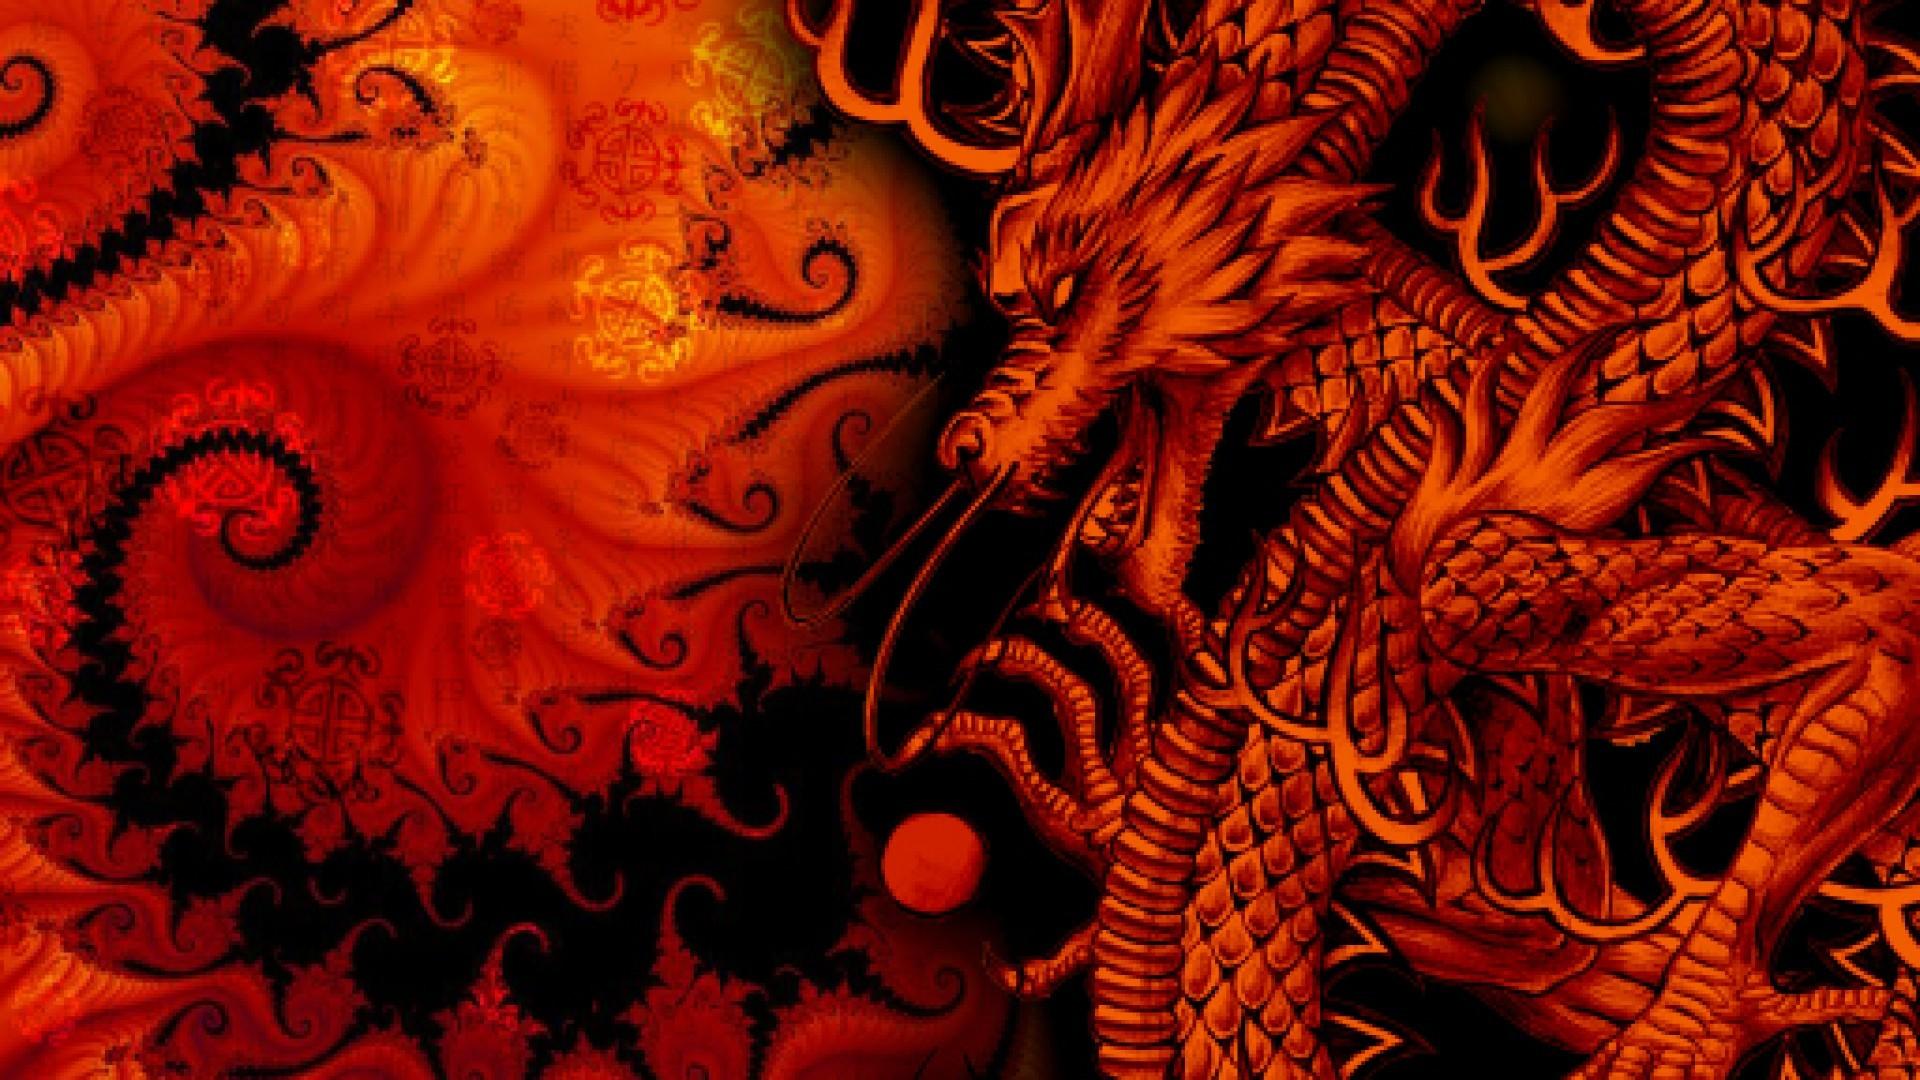 0 Dragon HD Wallpapers Dragon HD Wallpapers 1080p